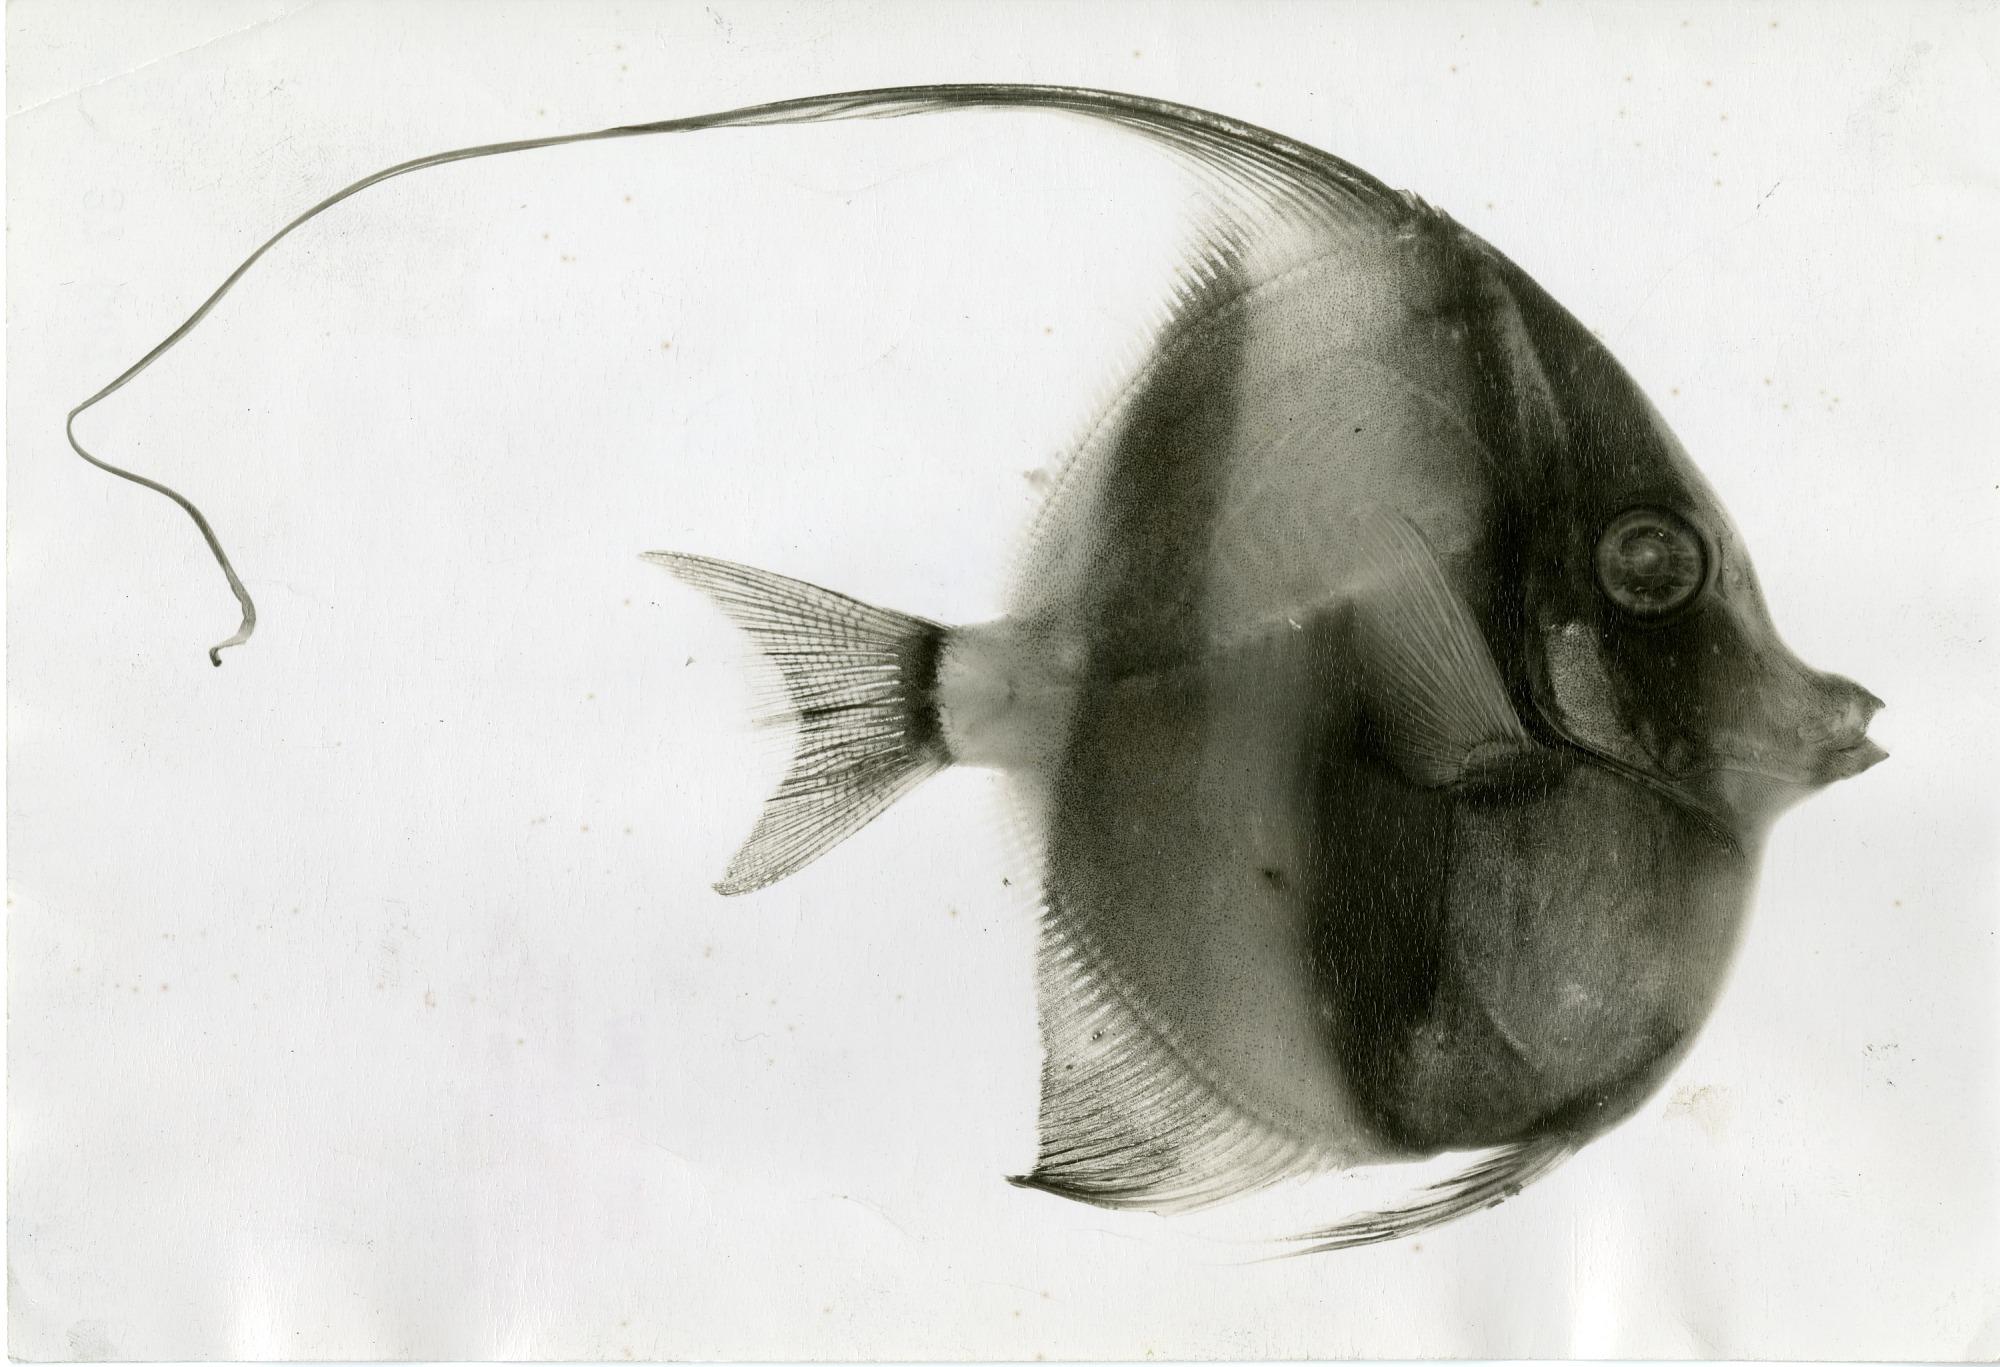 A Moorish idol (Zanclus canescens) fish specimen from Bikini Atoll